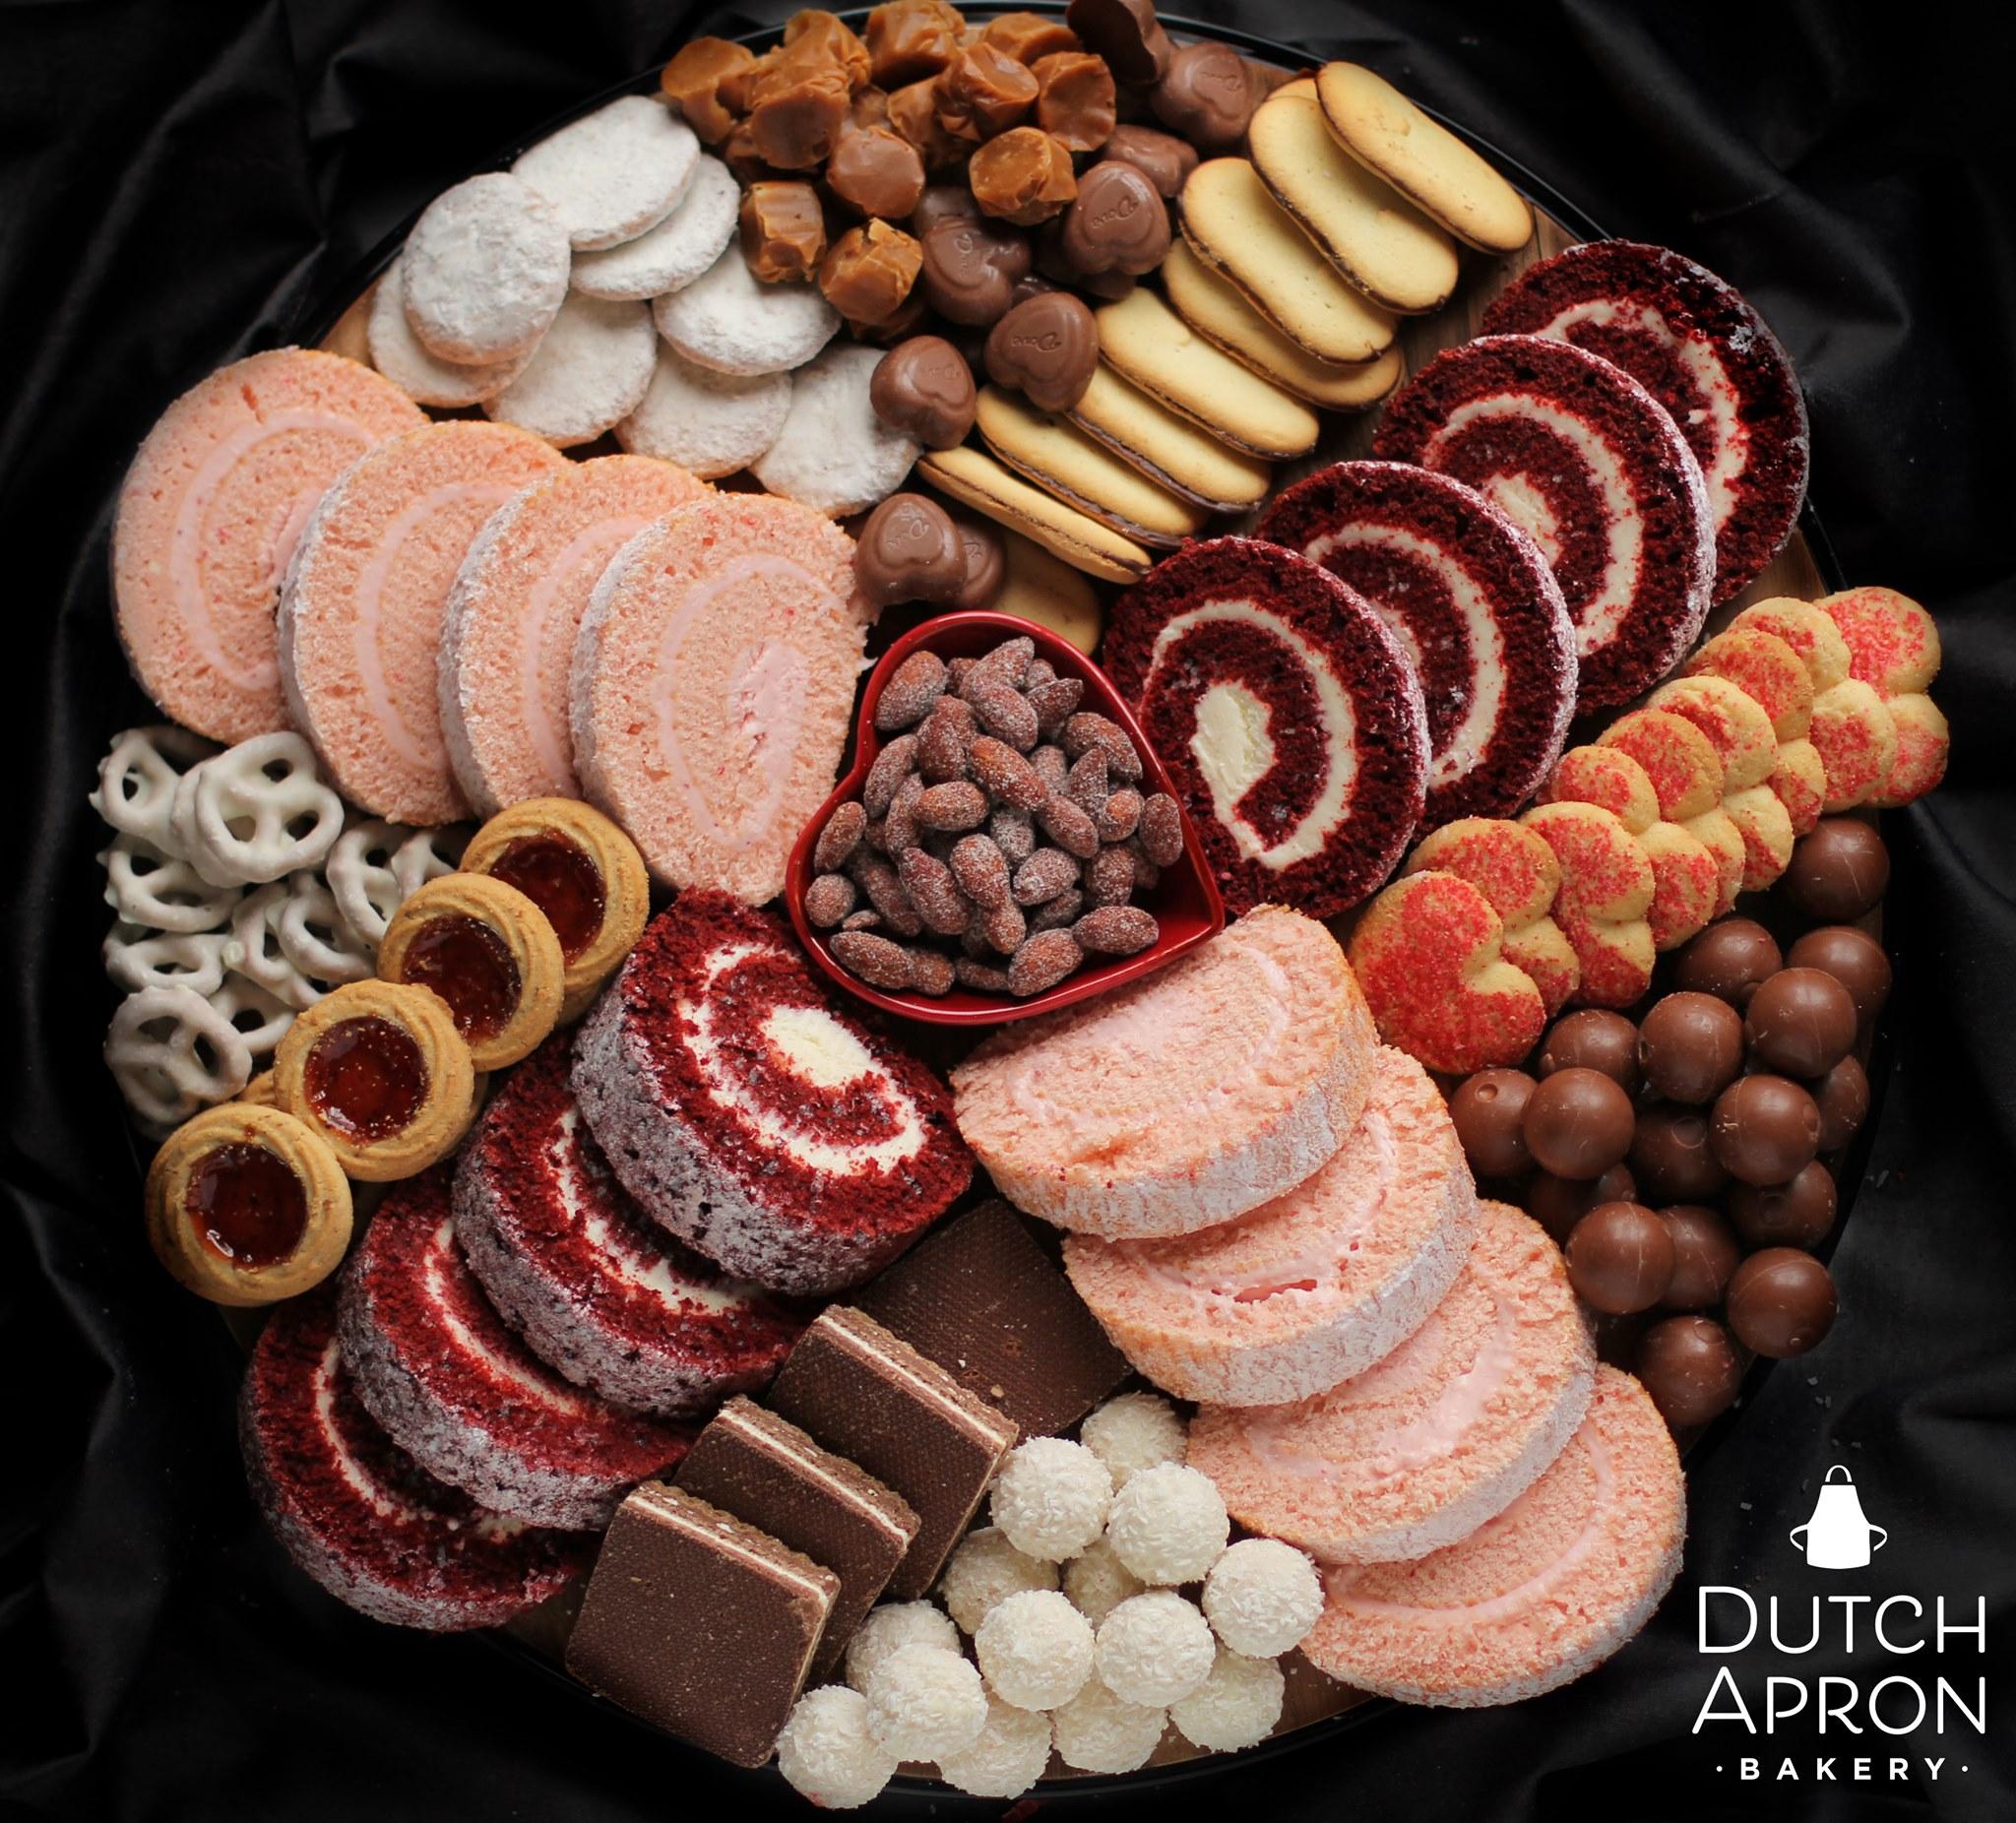 Dutch Apron Bakery Valentine Charcuterie Board